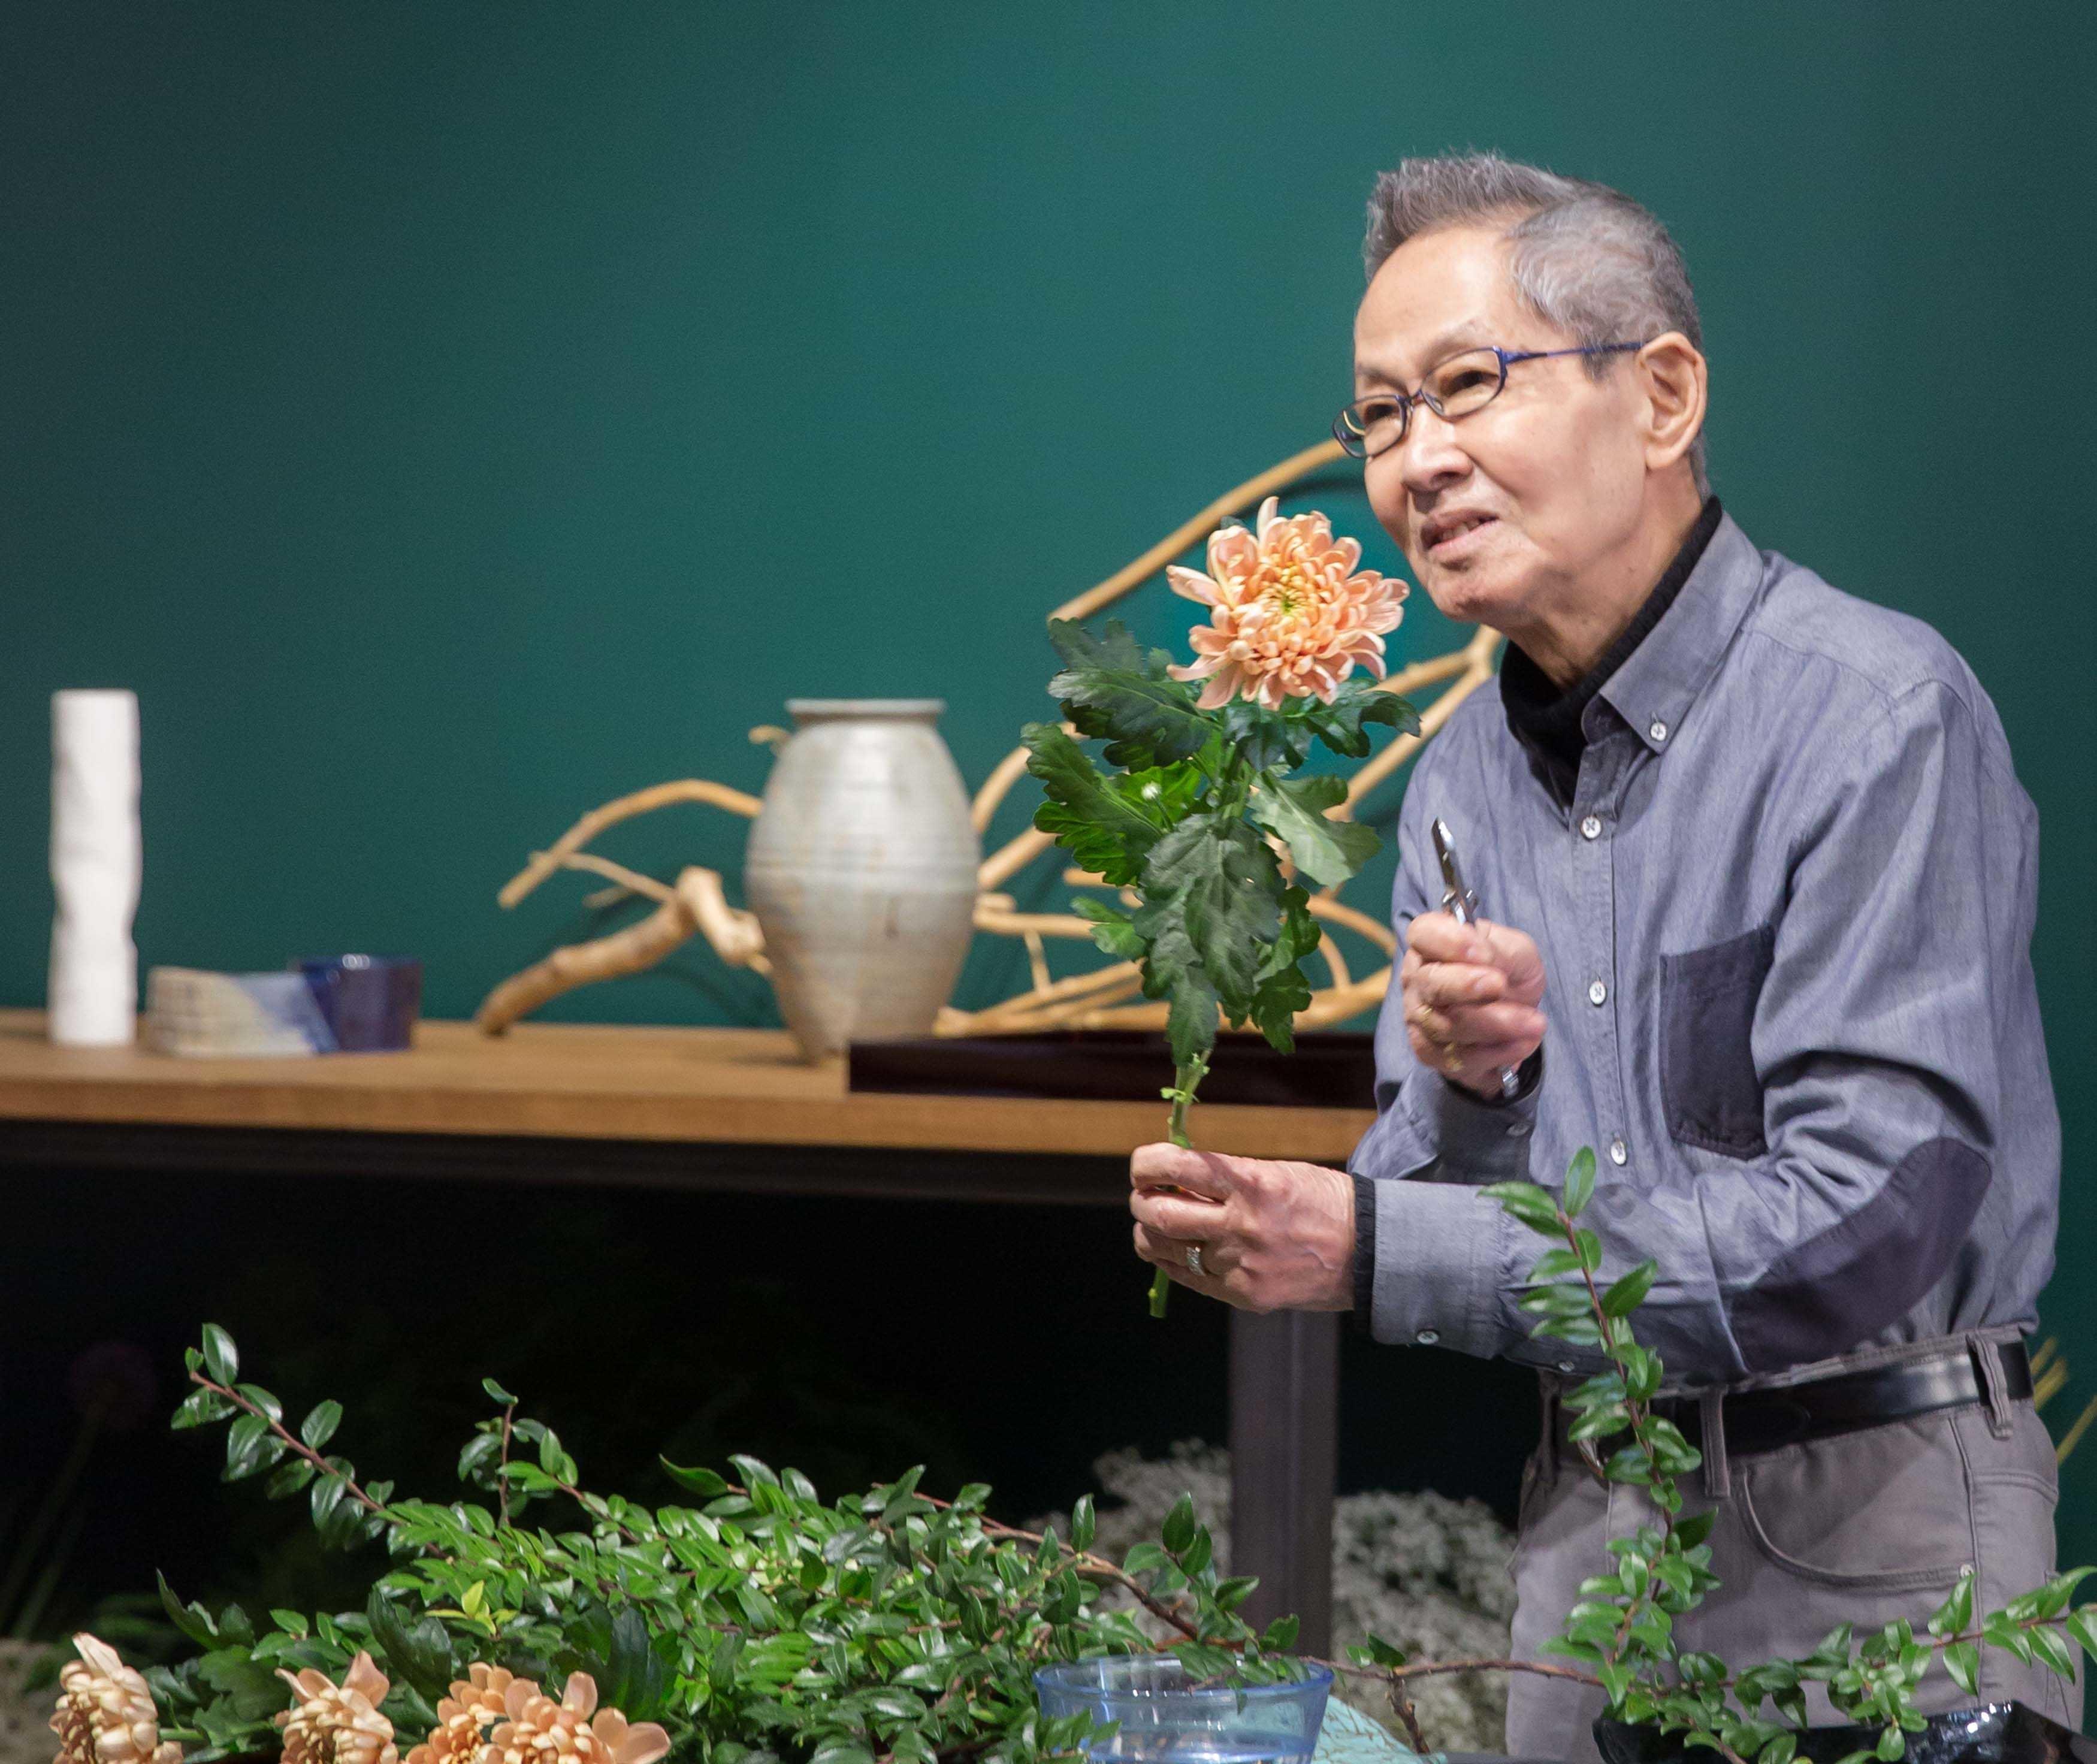 Mr_Suga_Ikebana_Master_visits_LFS